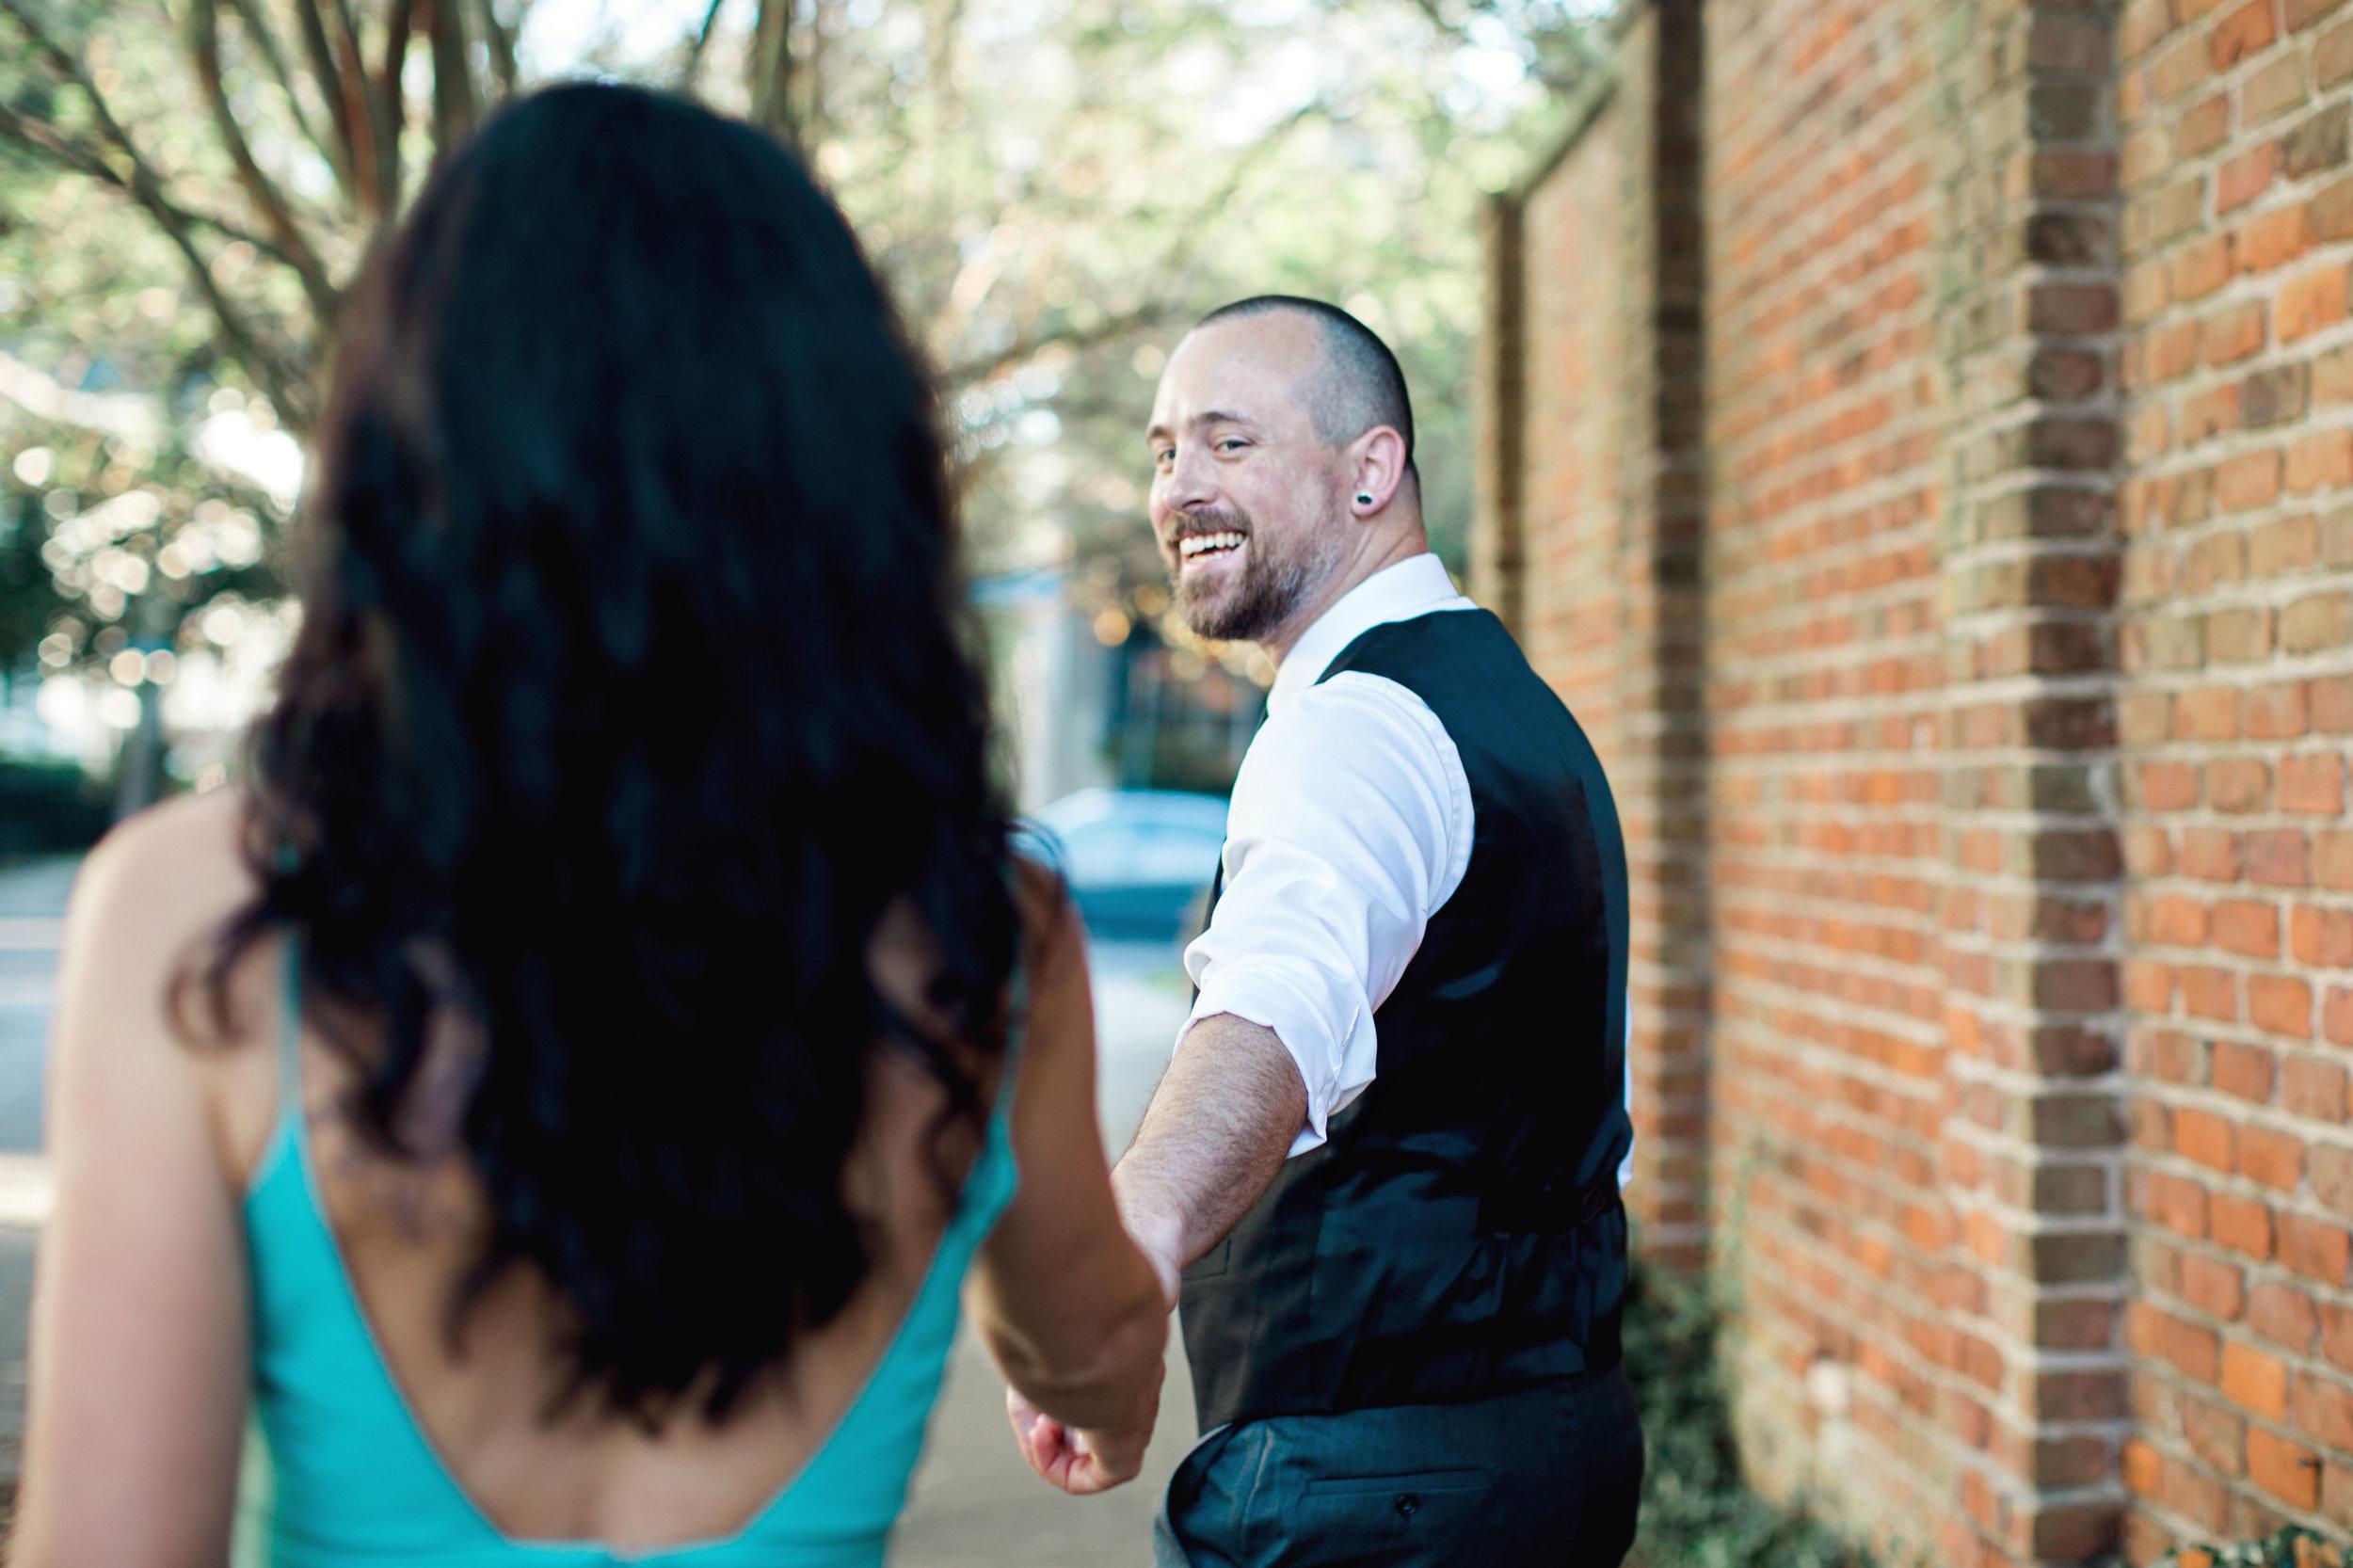 CindyGiovagnoliPhotography_Seattle_Washington_PNW_Couple_Engagement_Portrait_Photography-004.jpg